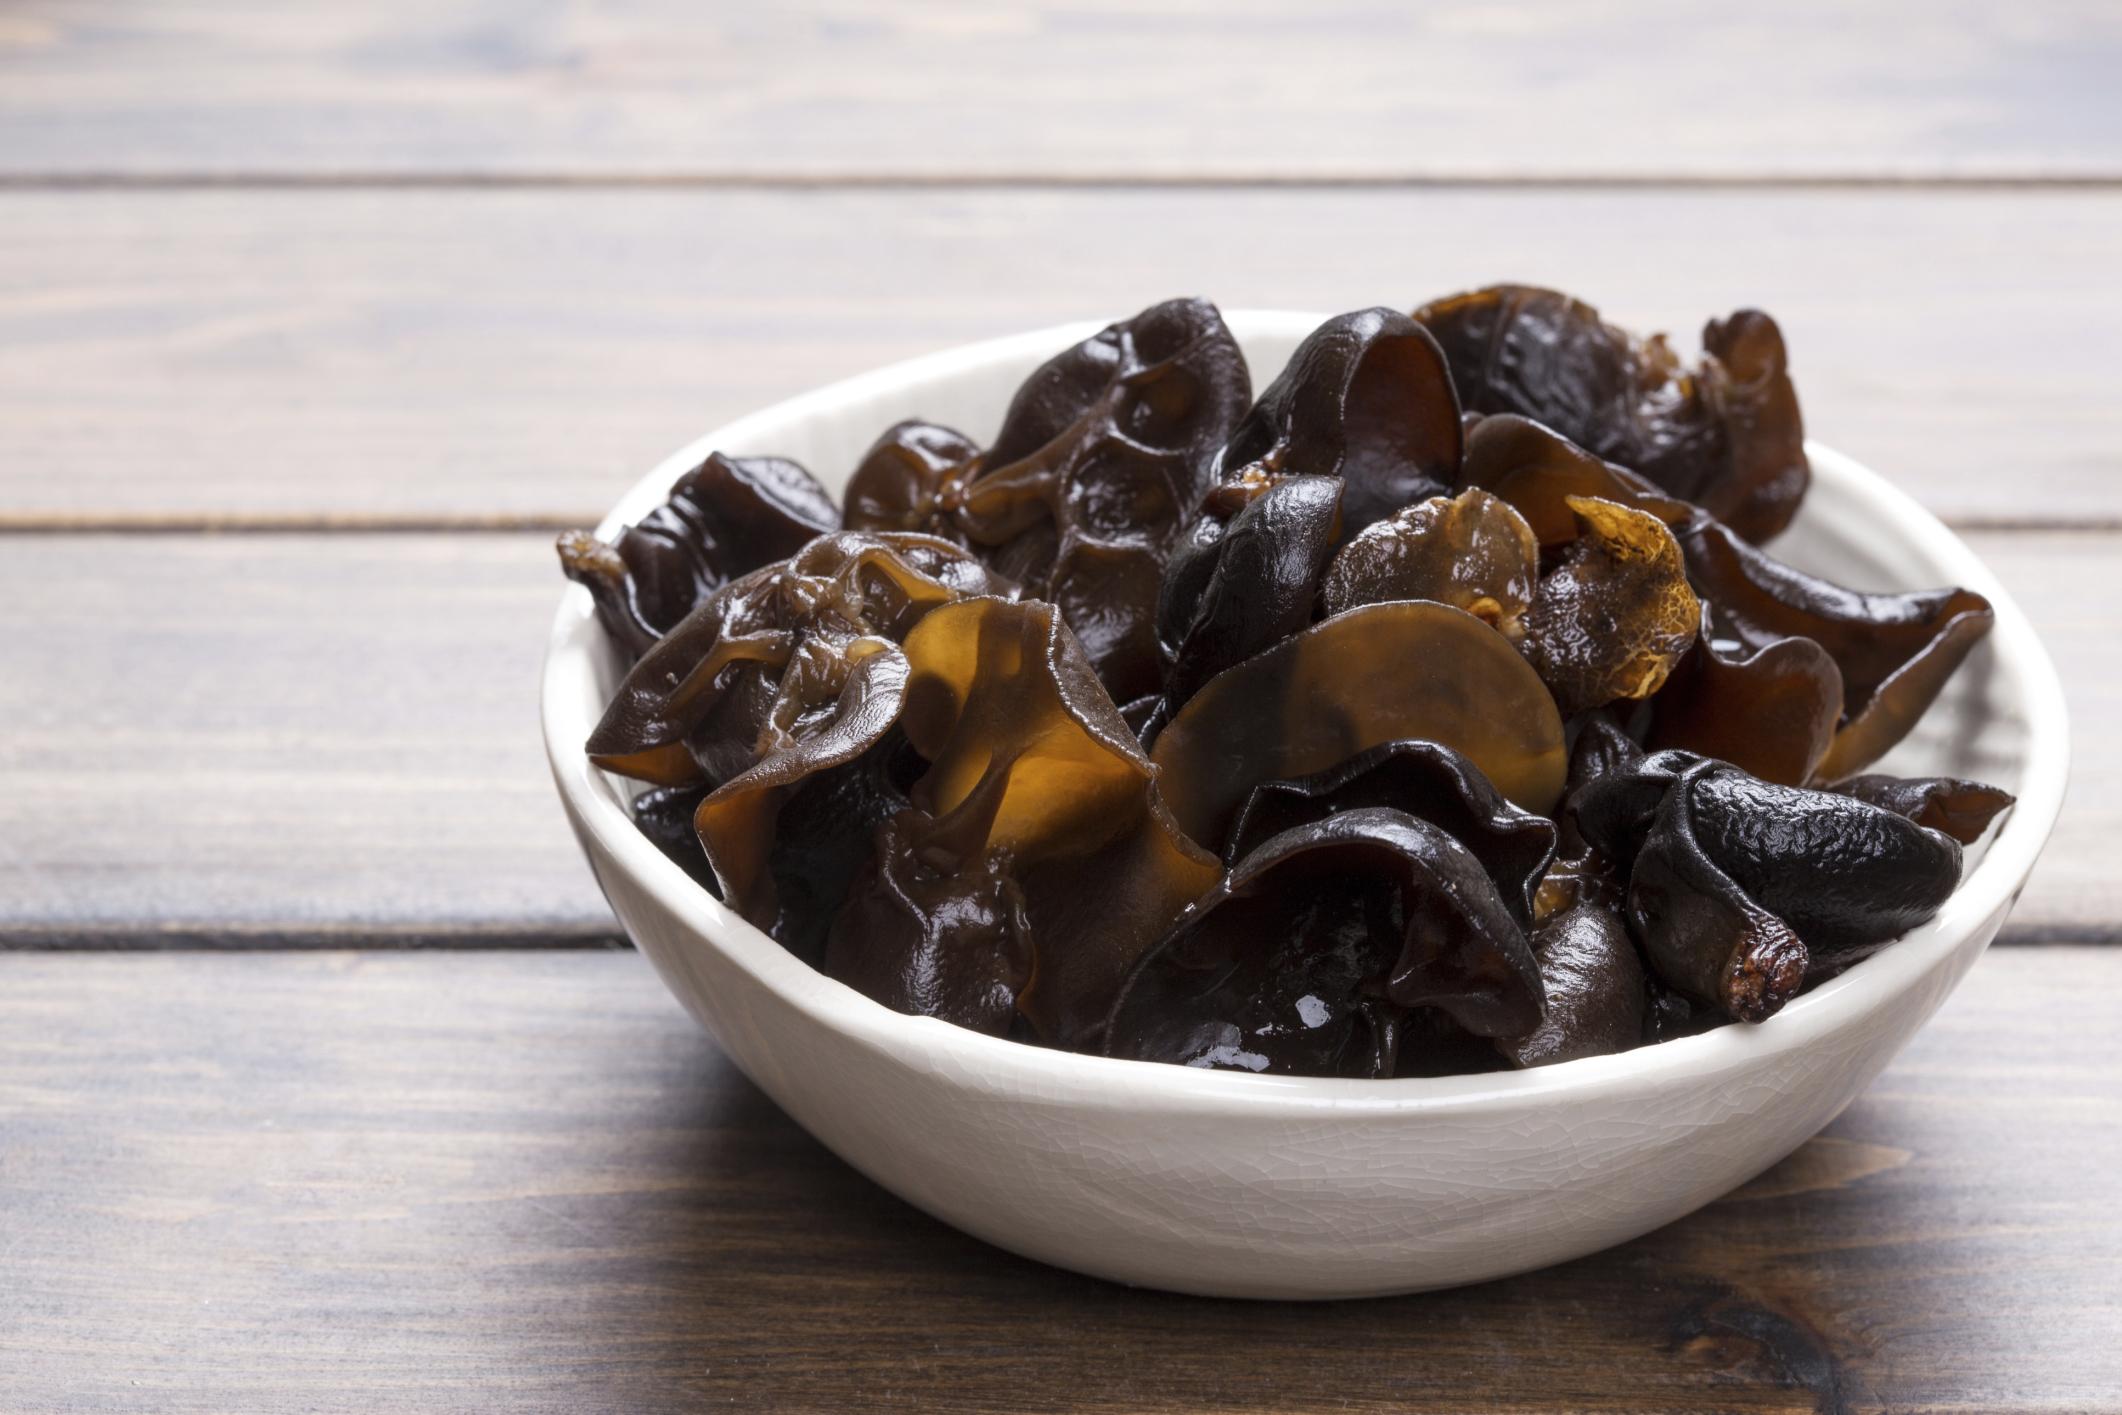 Chinese tree mushrooms. How to cook wood mushrooms 36